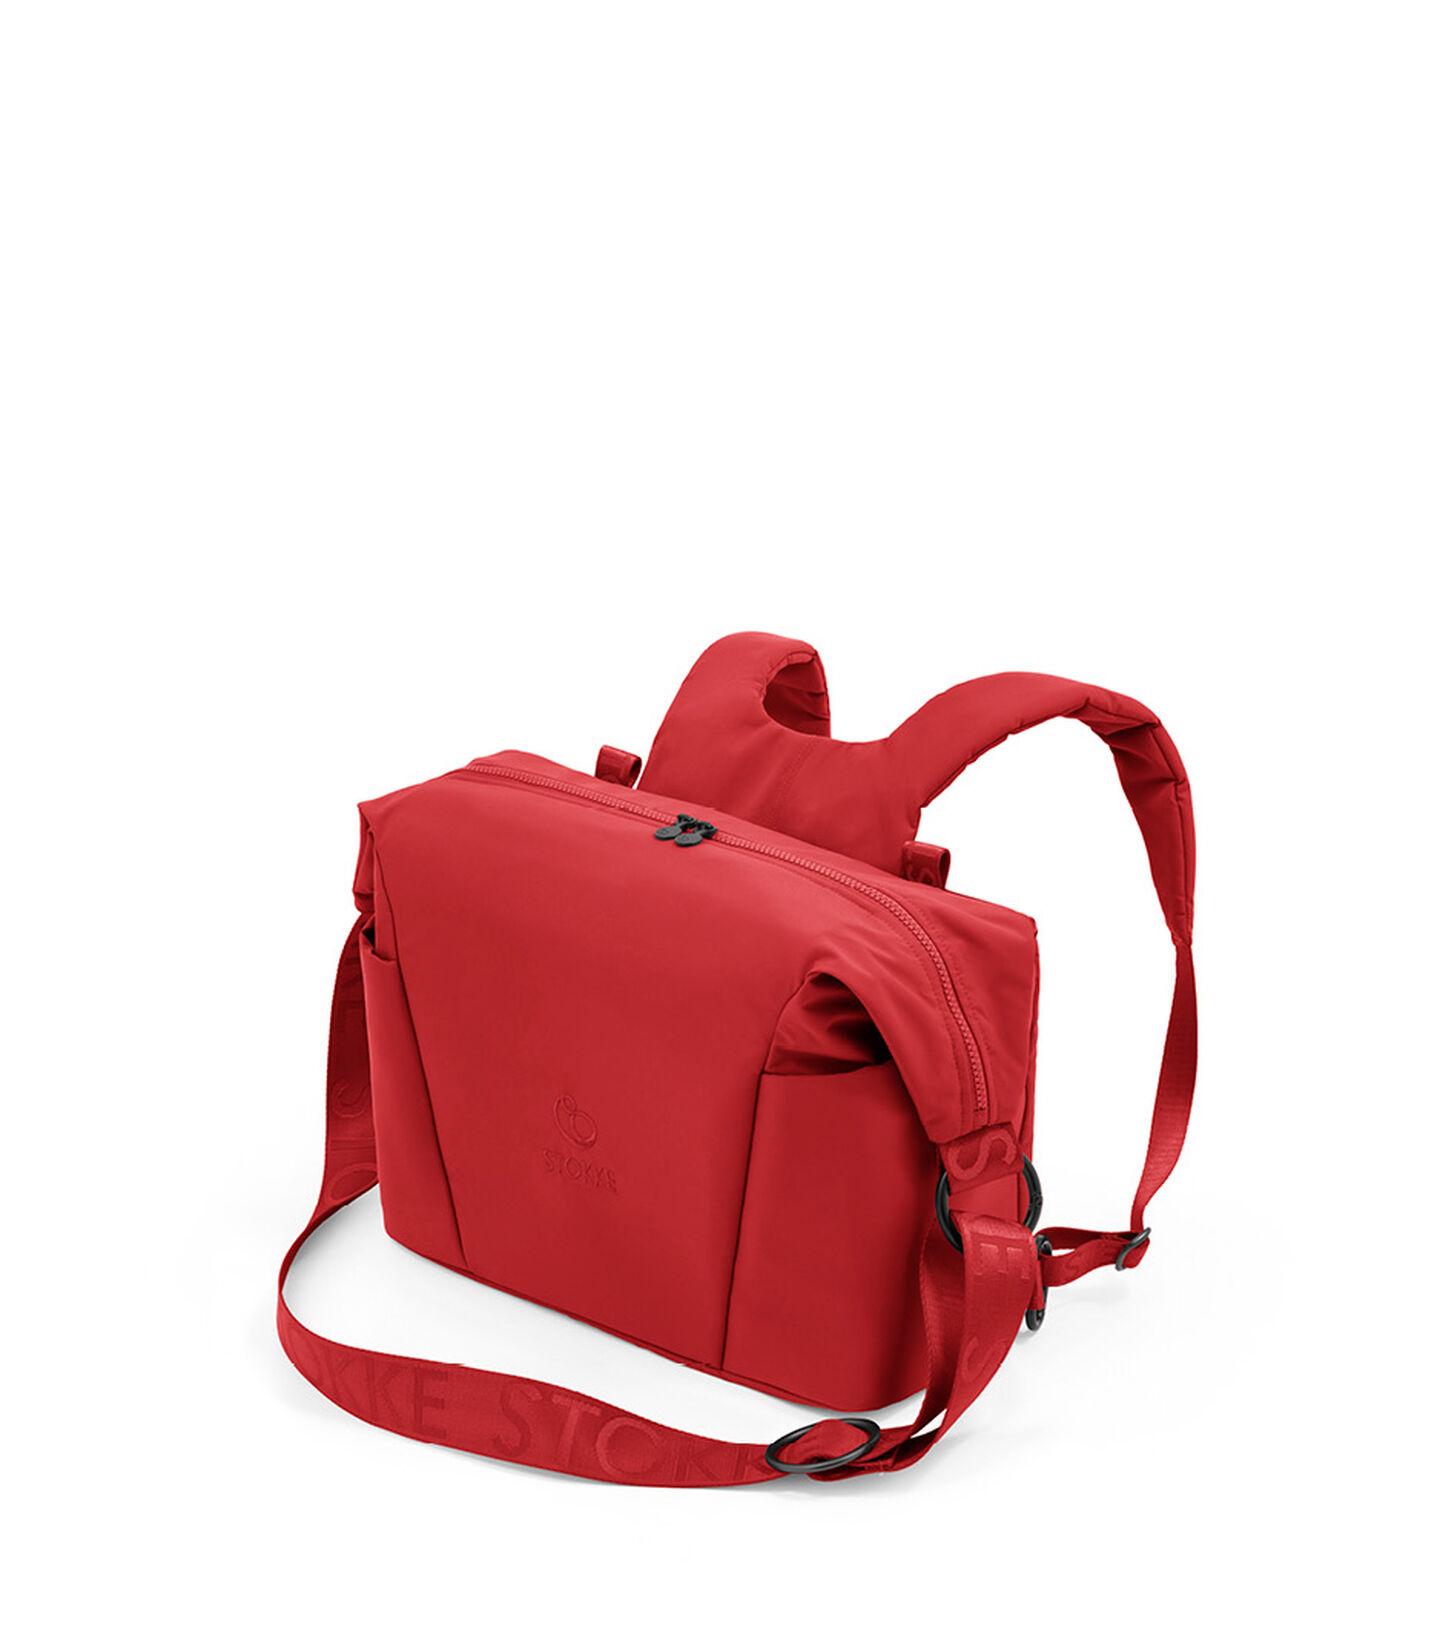 Stokke® Xplory® X Changing bag Ruby Red, Rojo Rubí, mainview view 2